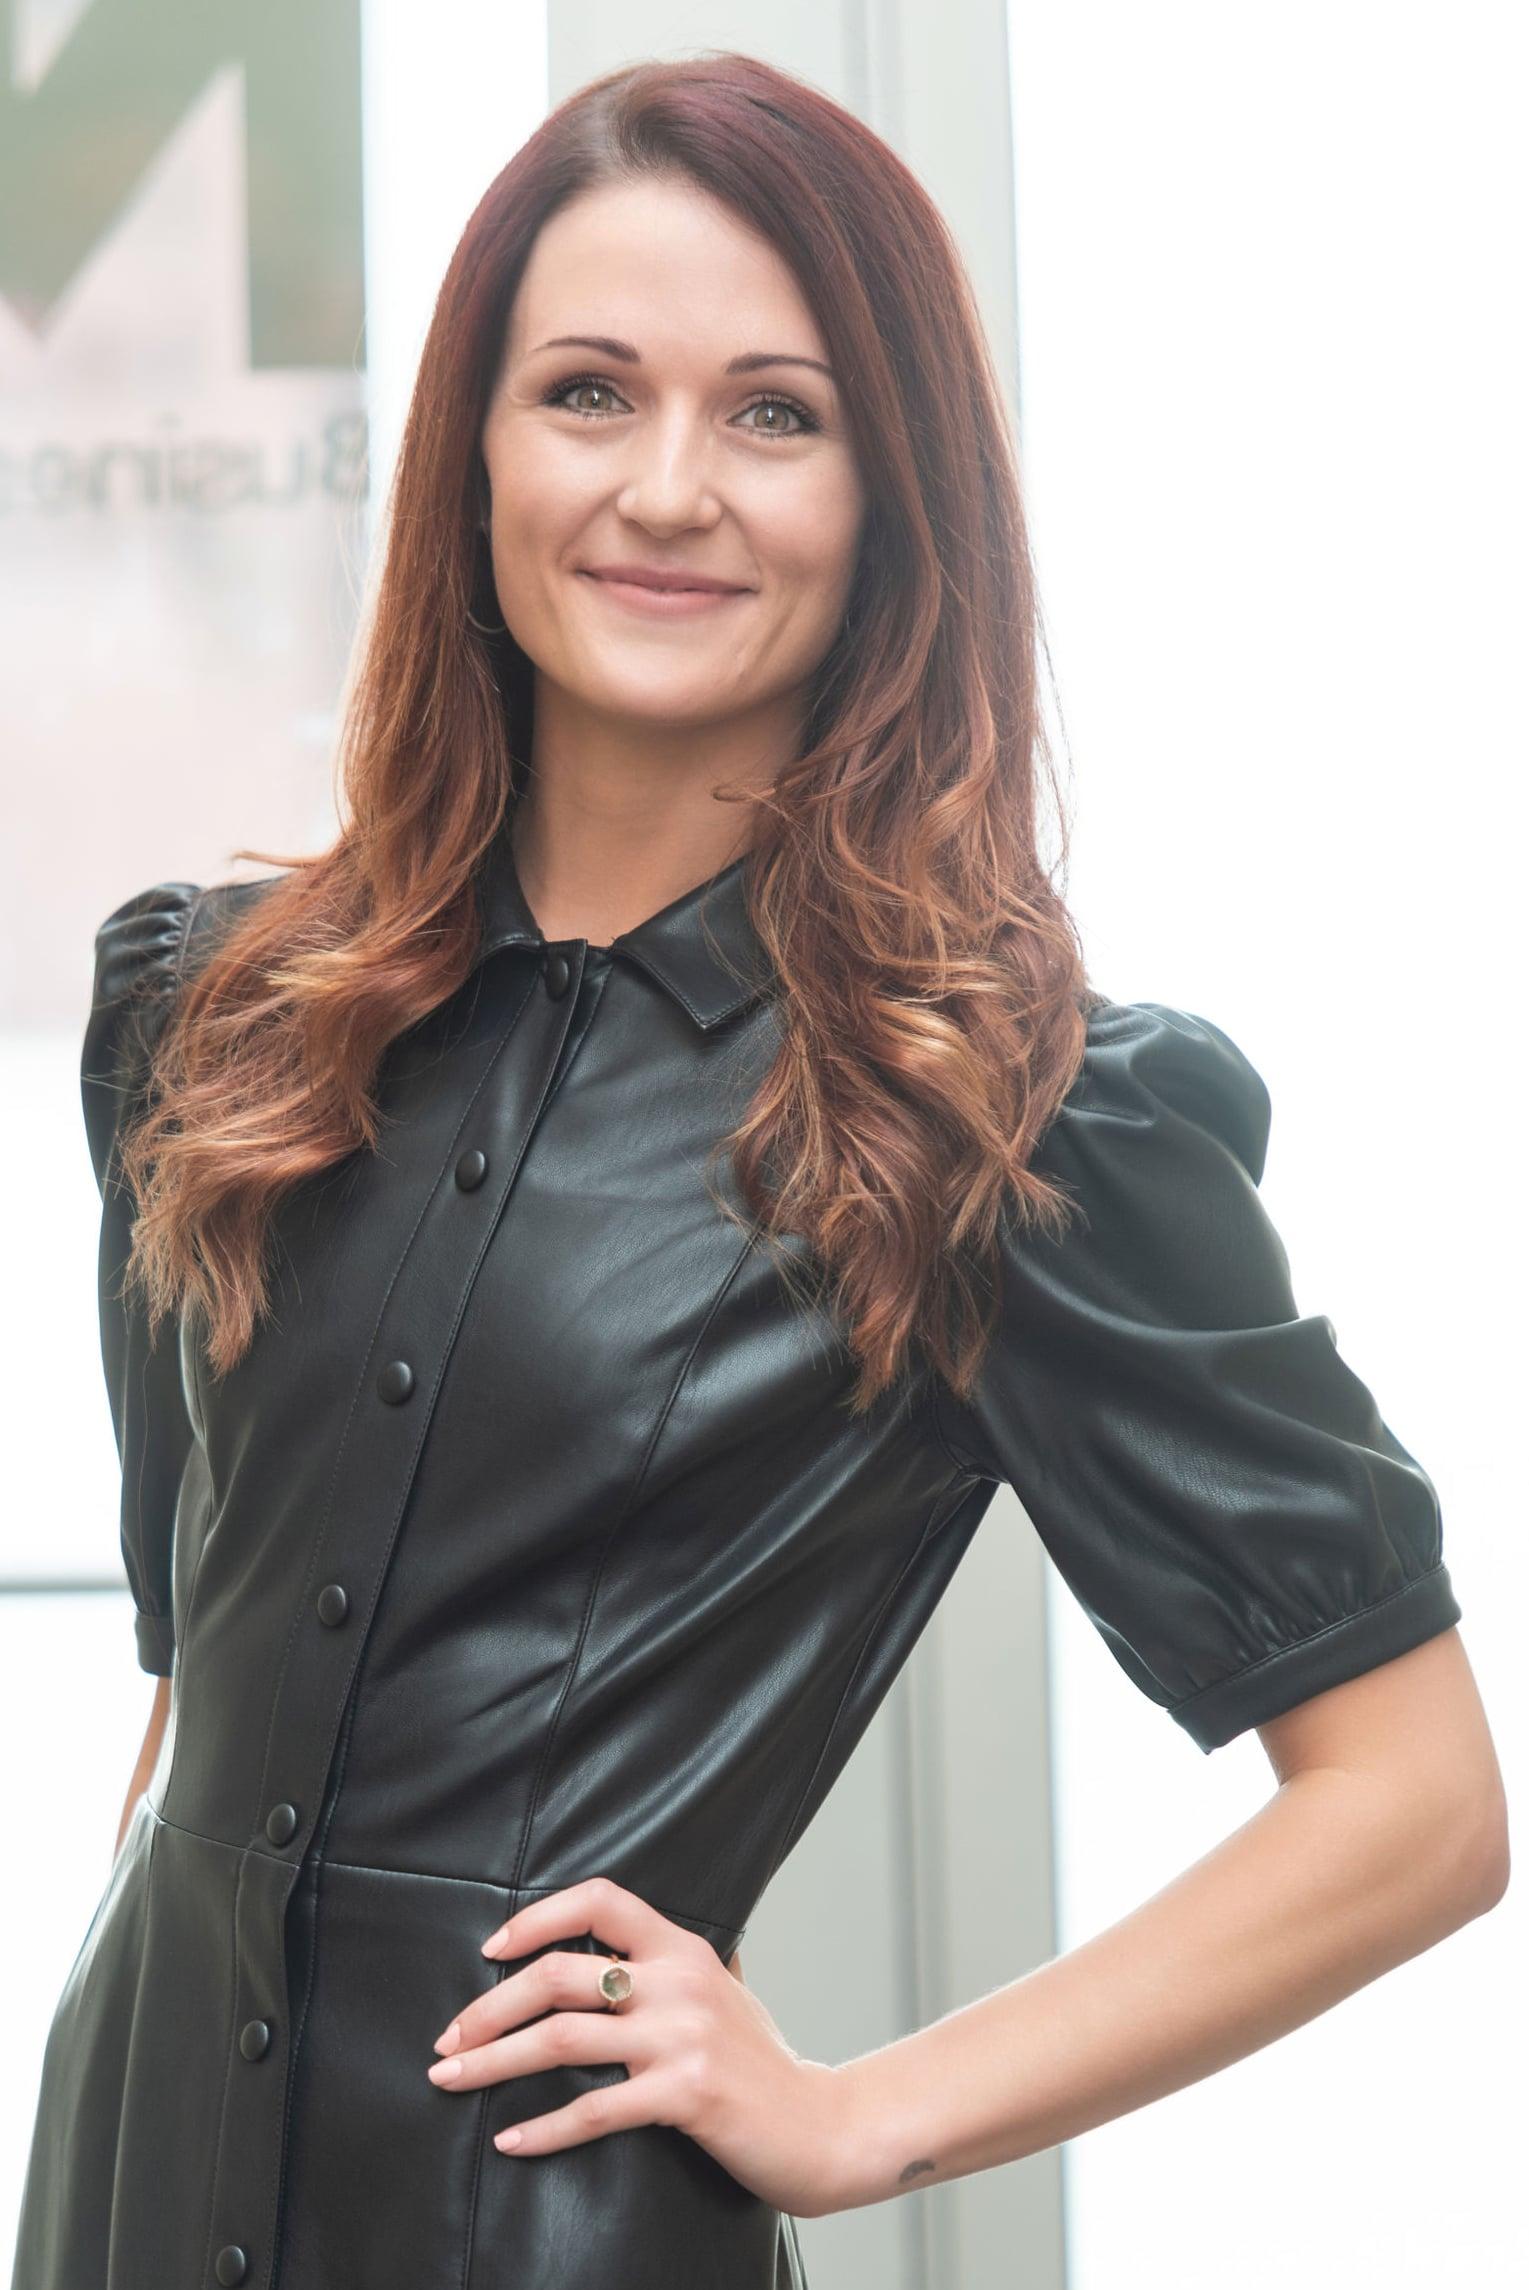 Katelyn Panella